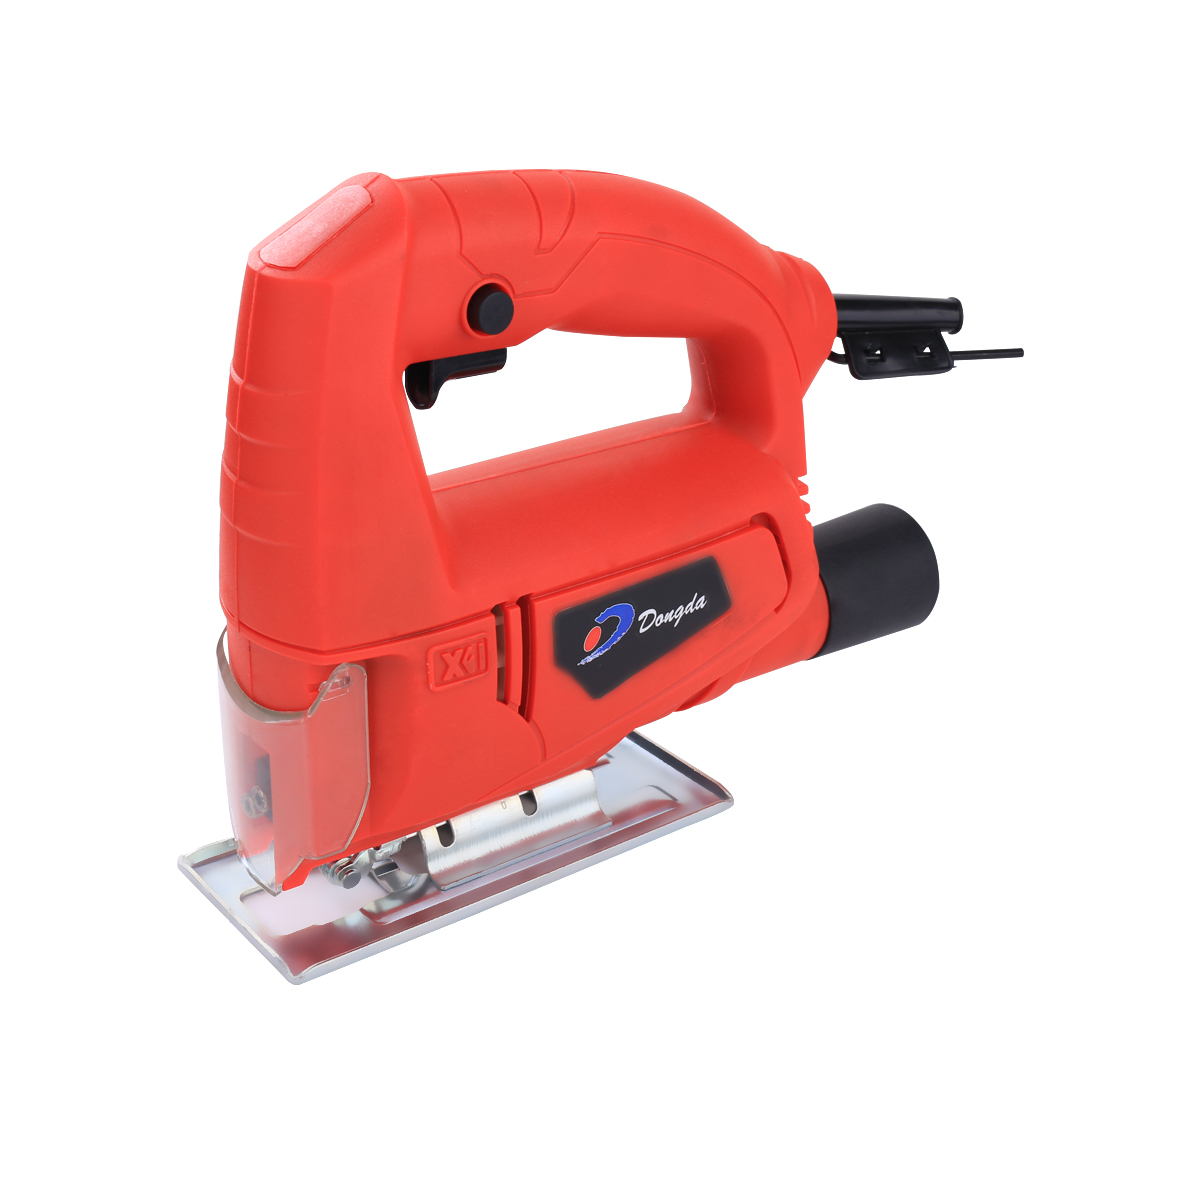 цена на Power Tools 400W 220V AC Electric Jigsaw Curve Saw Woodworking/steel Cutting Tool Mini Portable Home Improvement Tools